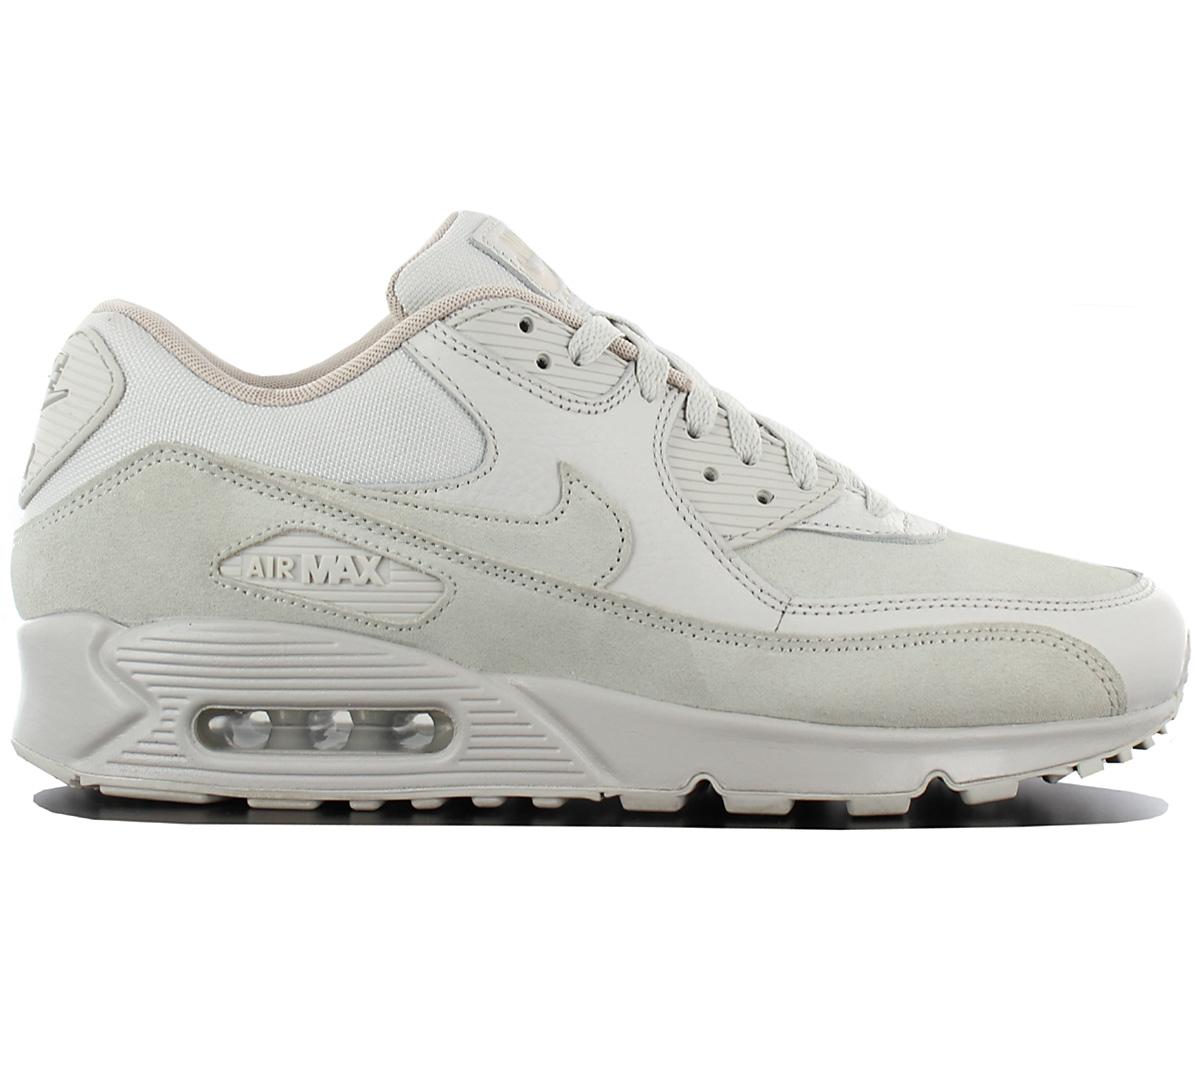 Details about Nike Air Max 90 Leather Premium Men's Sneaker Light Bone 700155 013